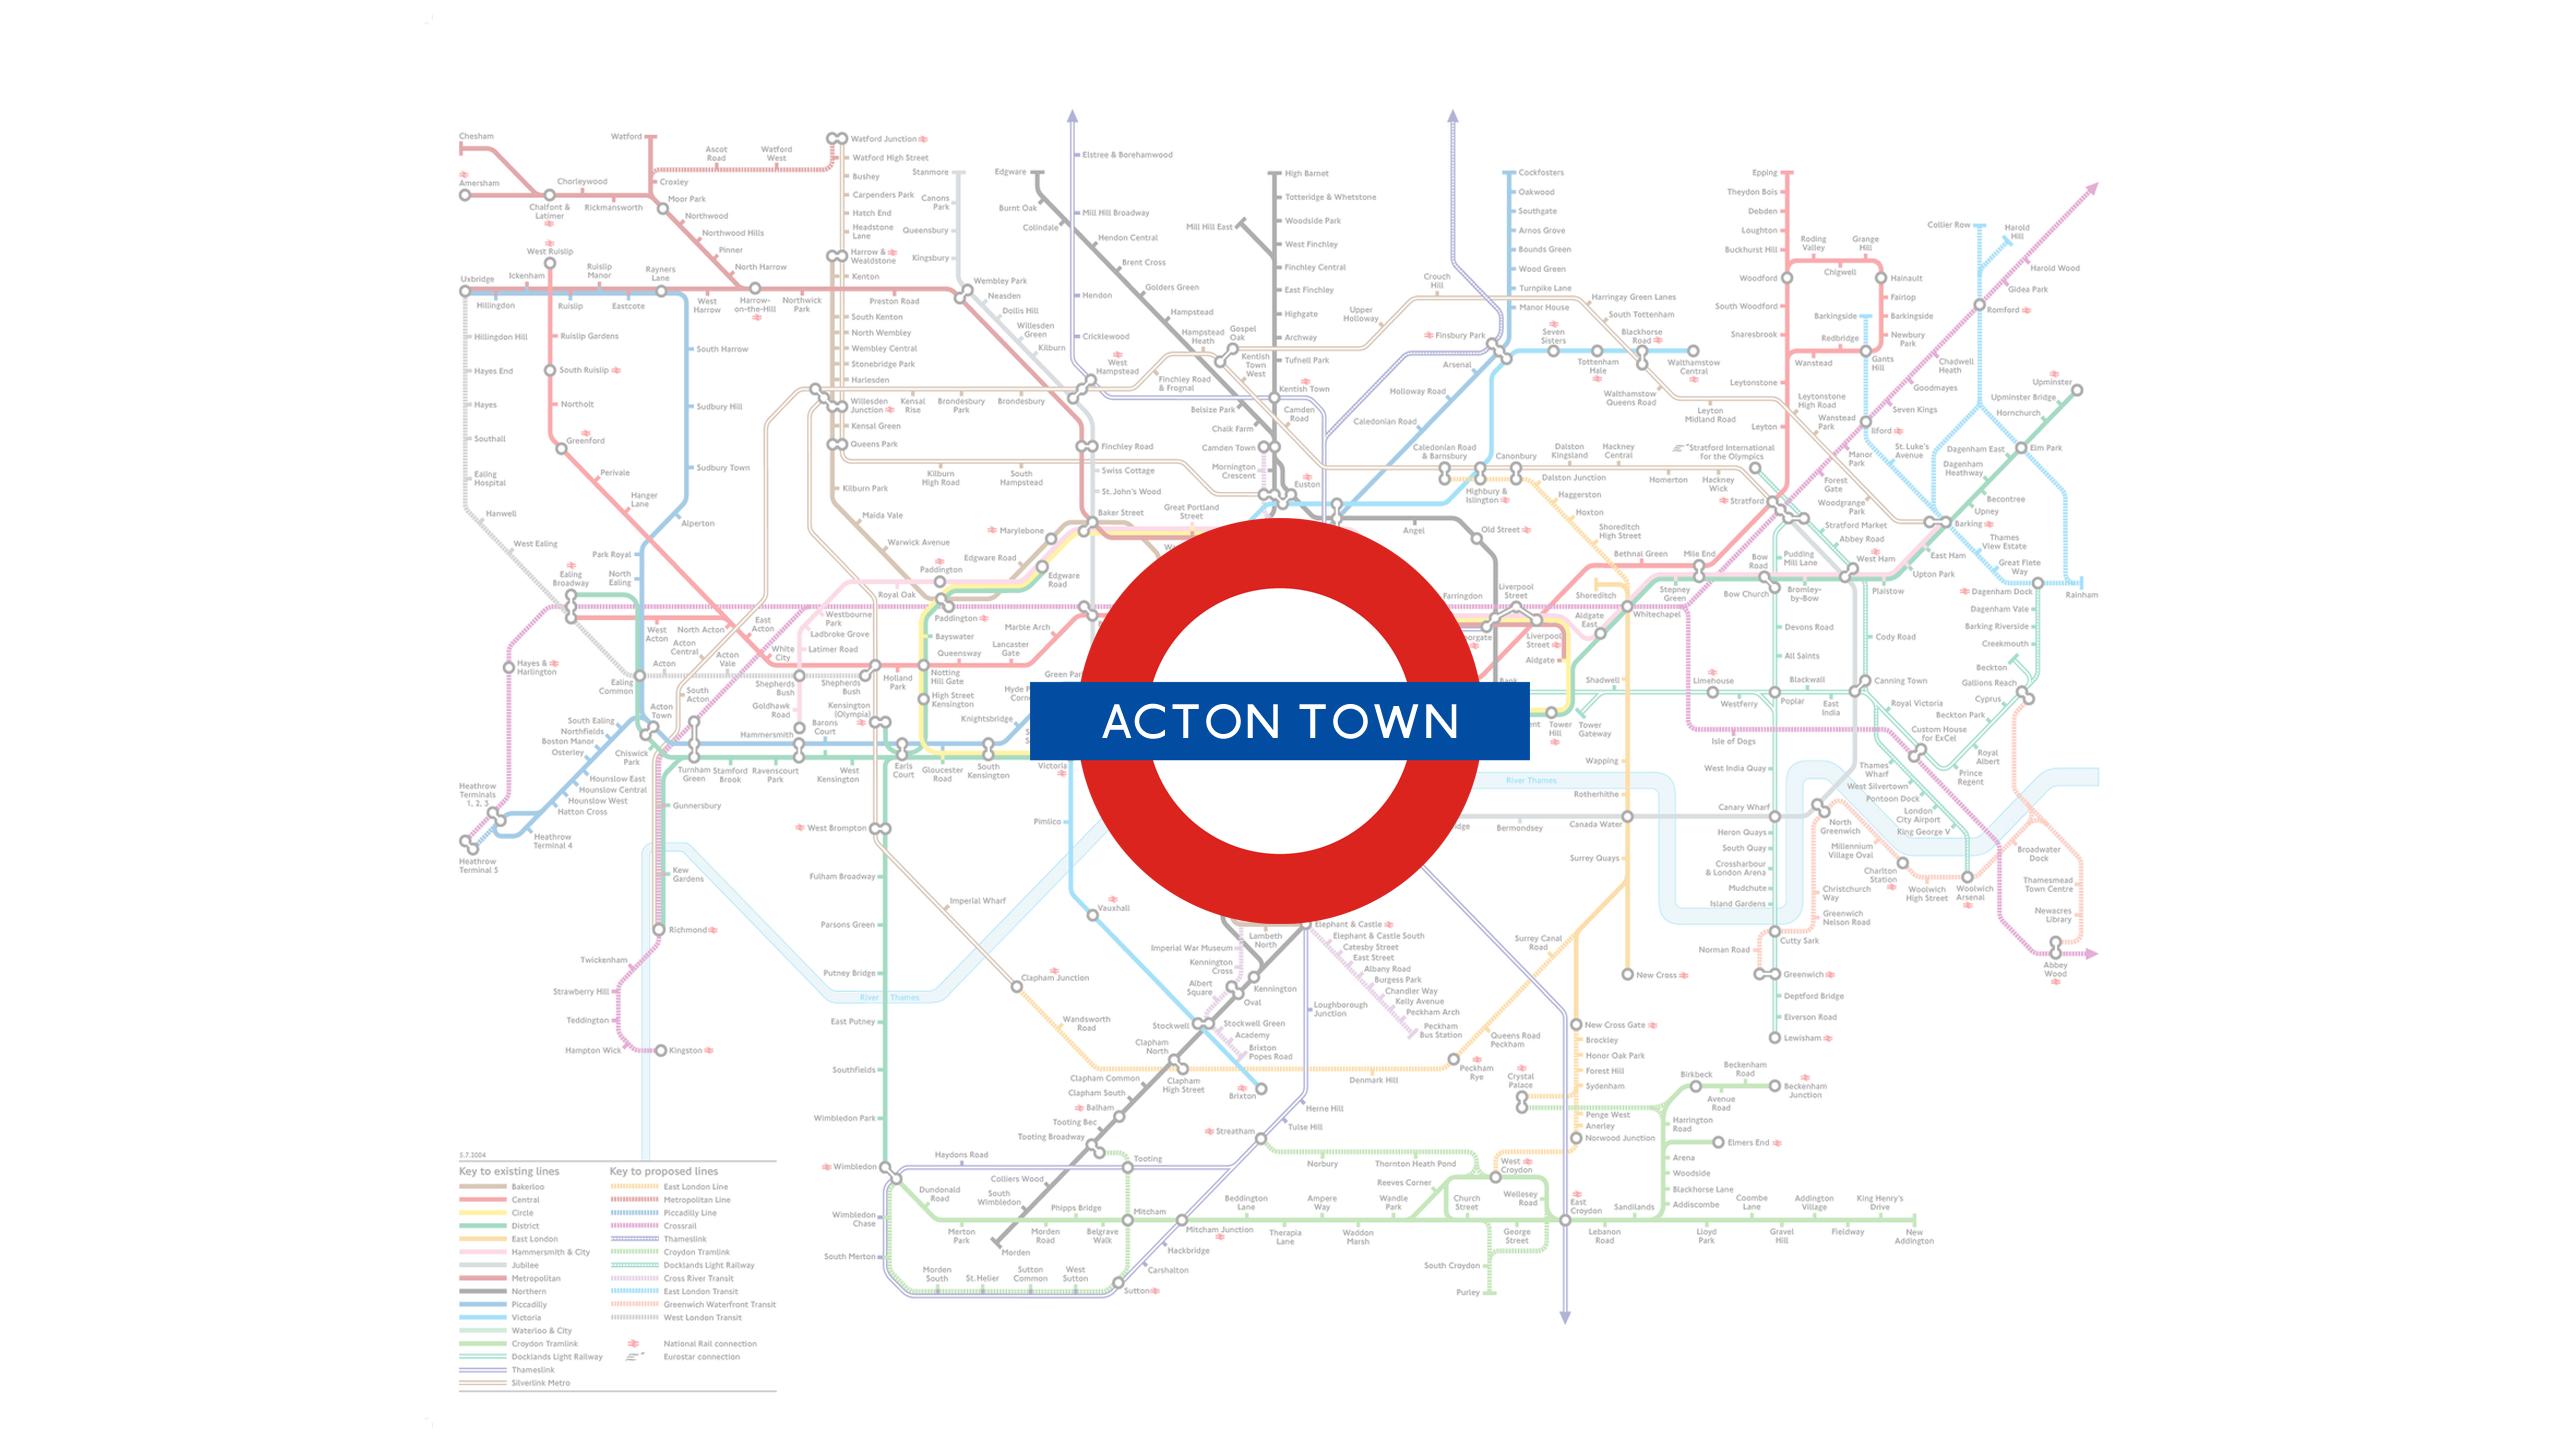 Acton Town (Map)